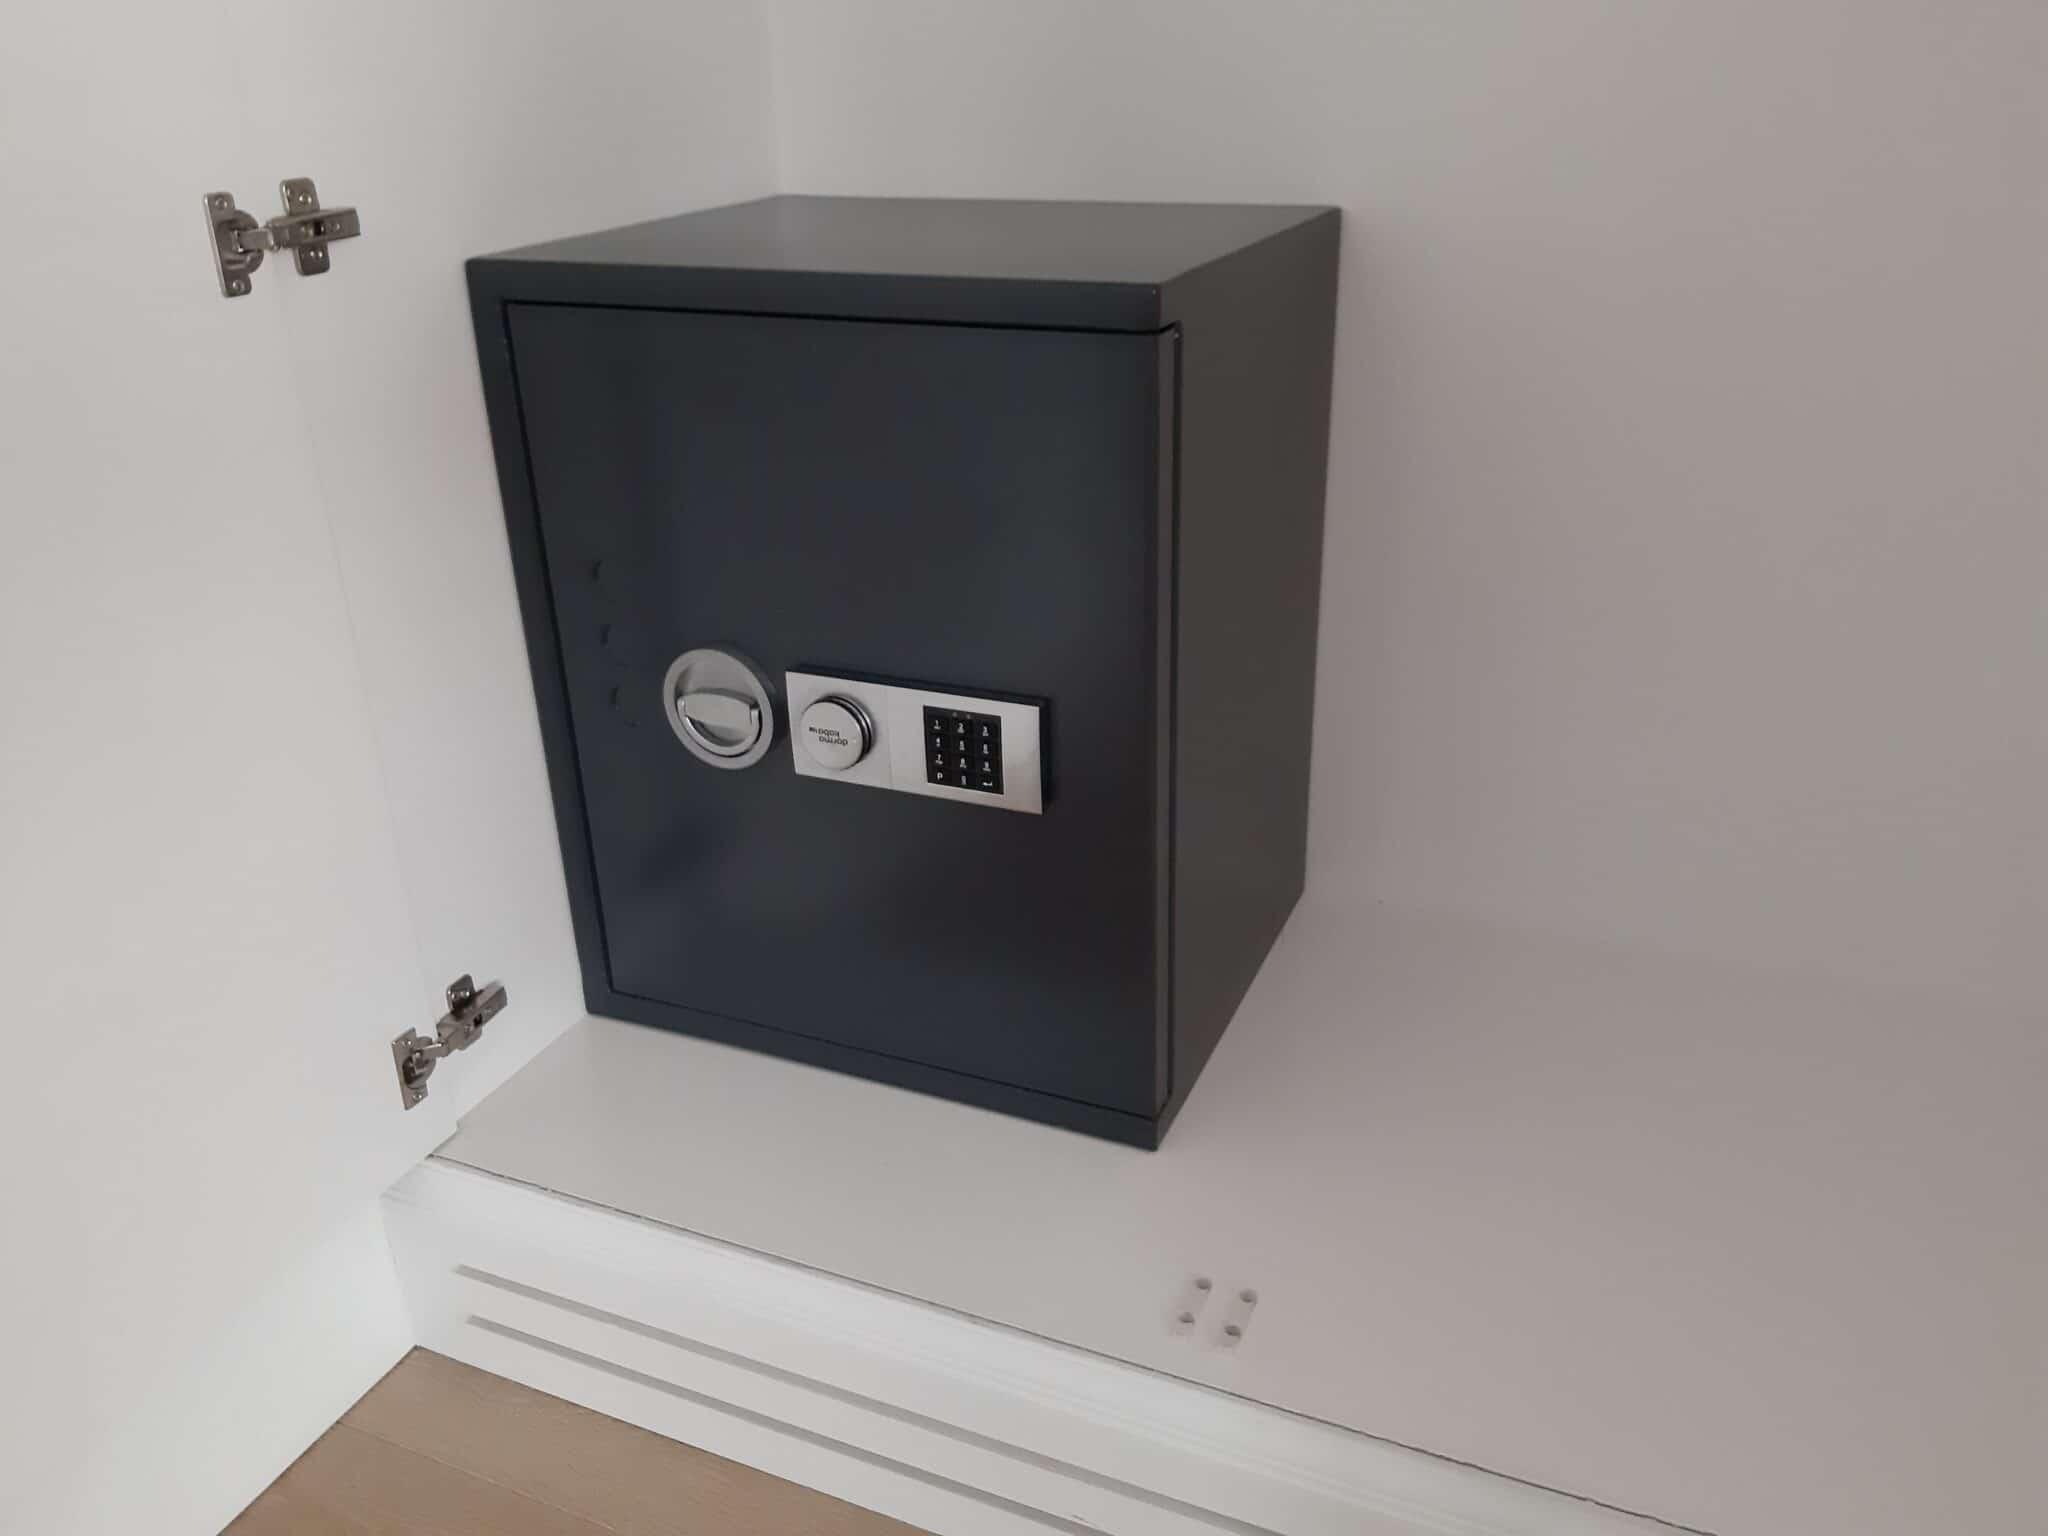 Lyra Eurograde 1 Size 3 Digital Safe